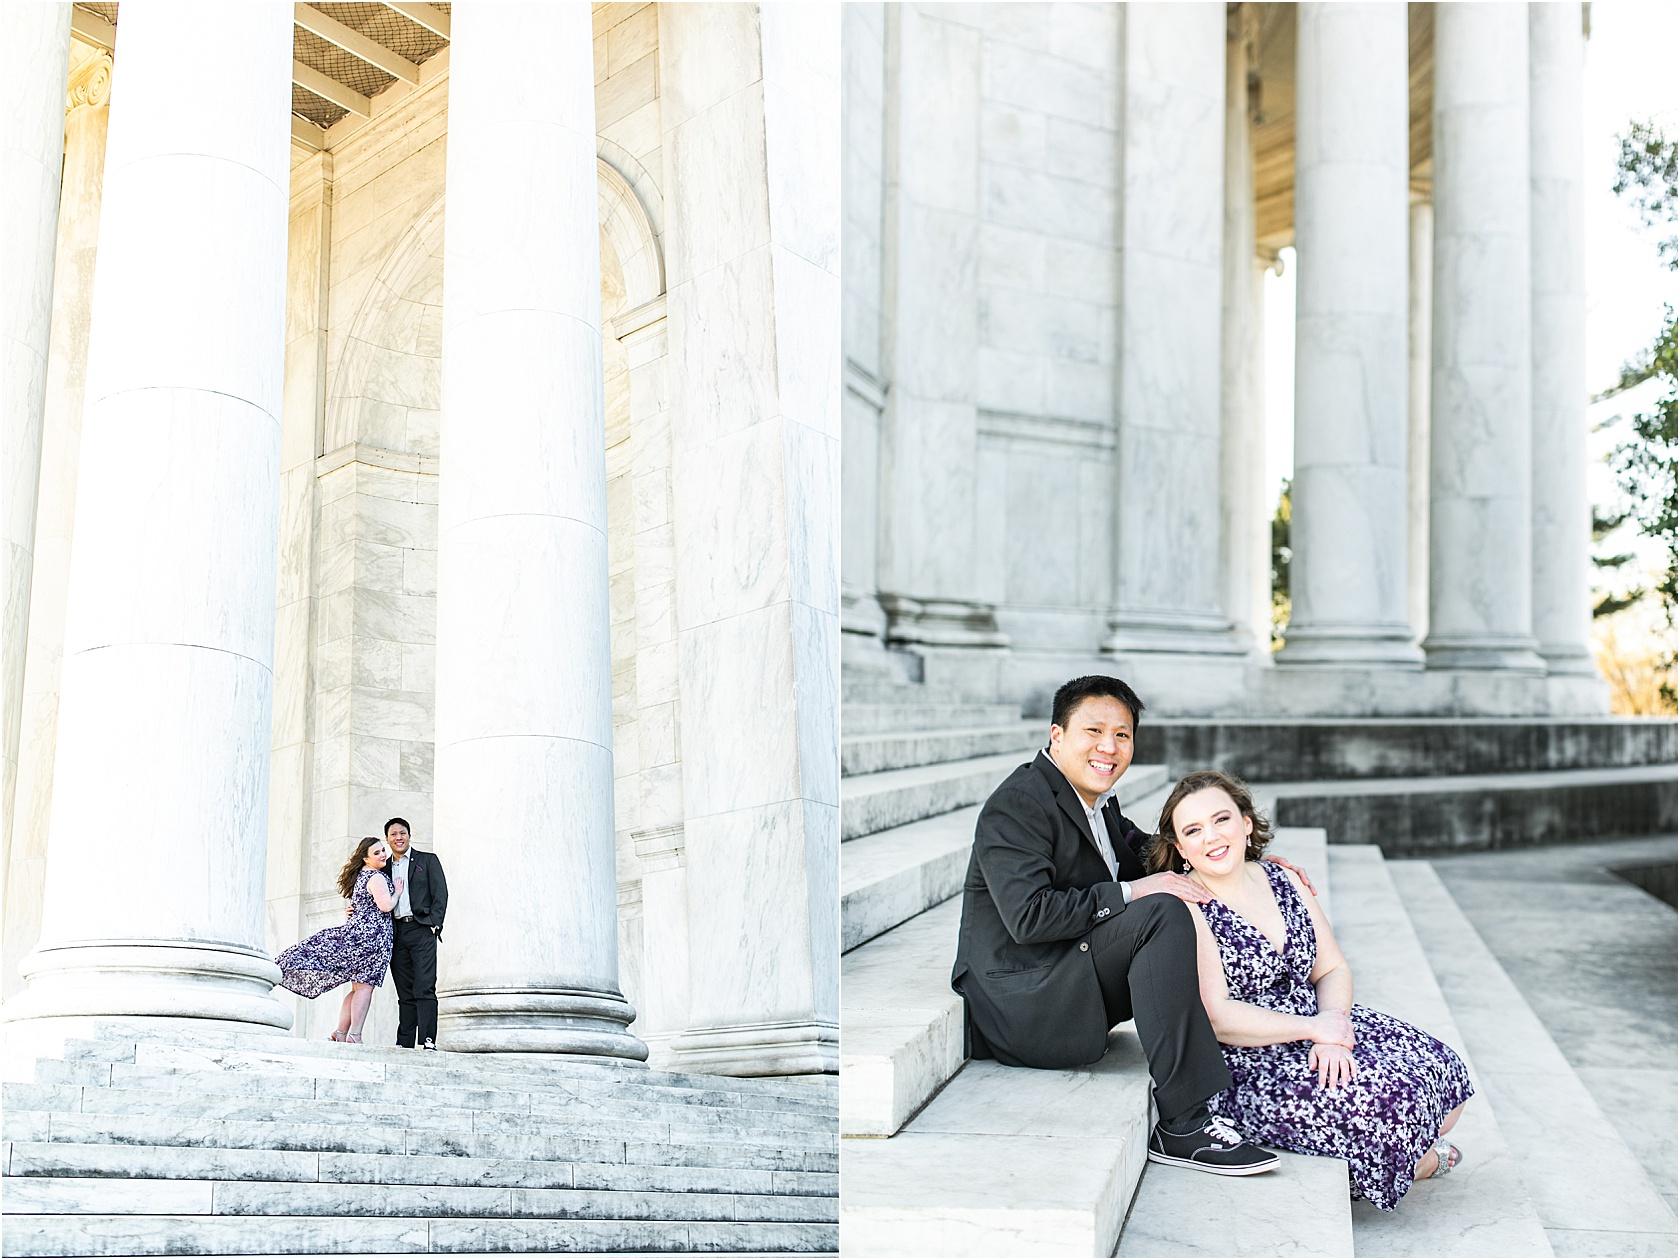 MelissaKevinCherryBlossomsDCEngagementSessionMarch2019LivingRadiantPhotographyphotos_0023.jpg